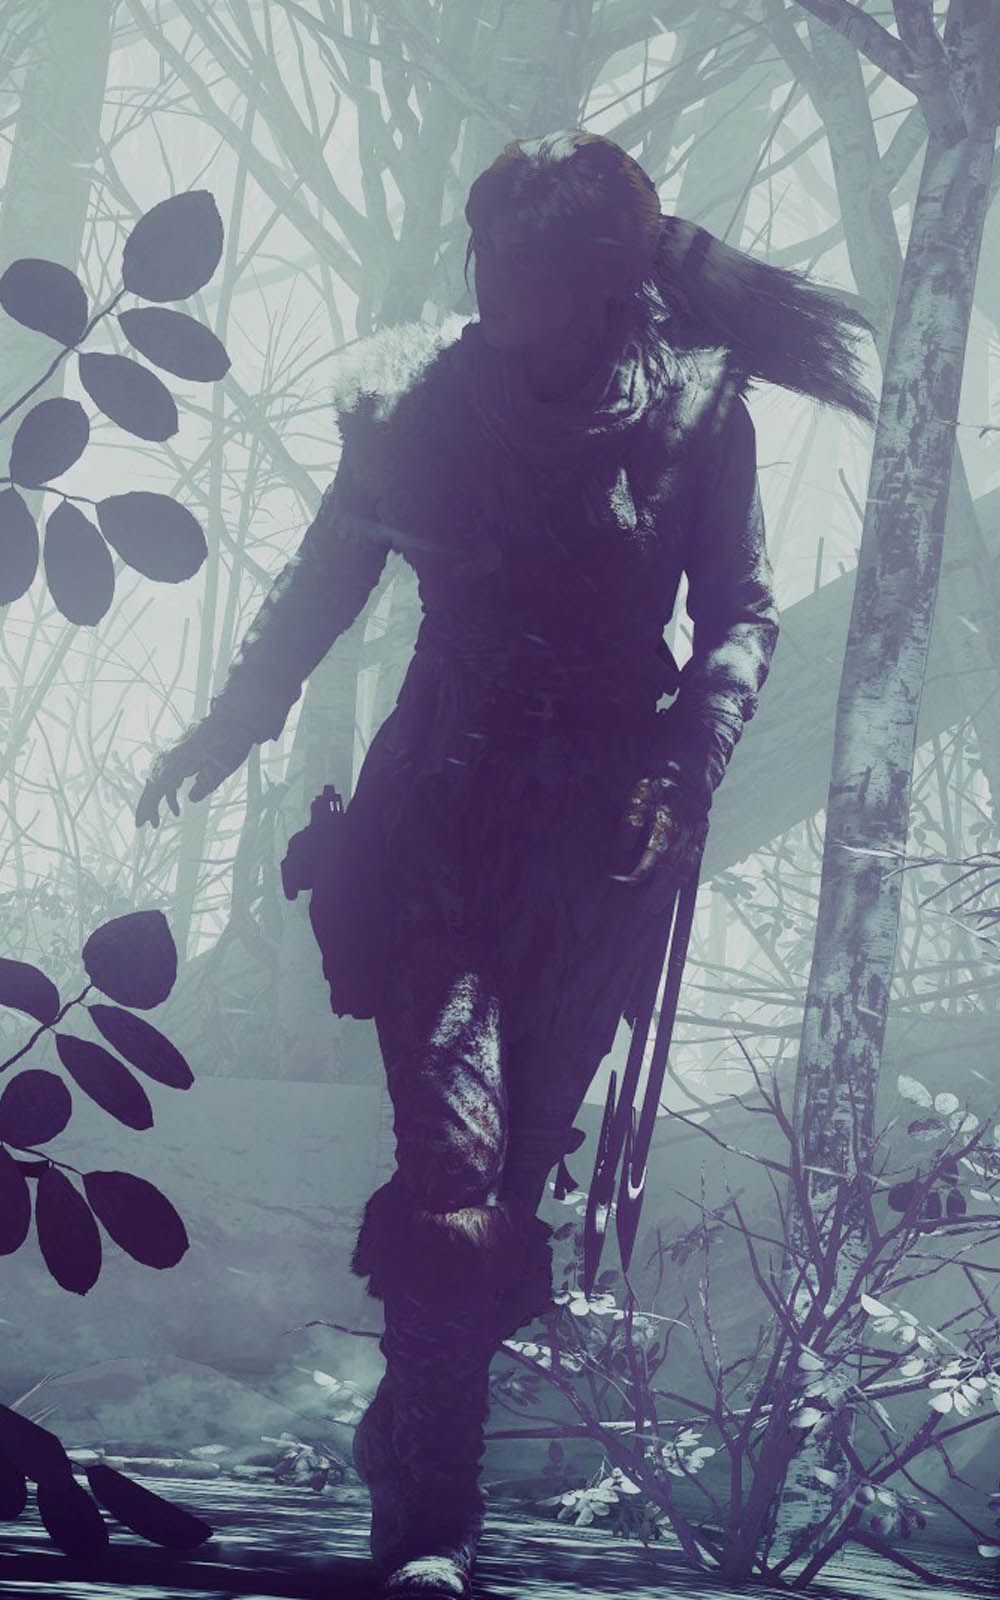 Download lara croft in rise of the tomb raider free pure - Rise of the tomb raider 4k wallpaper ...